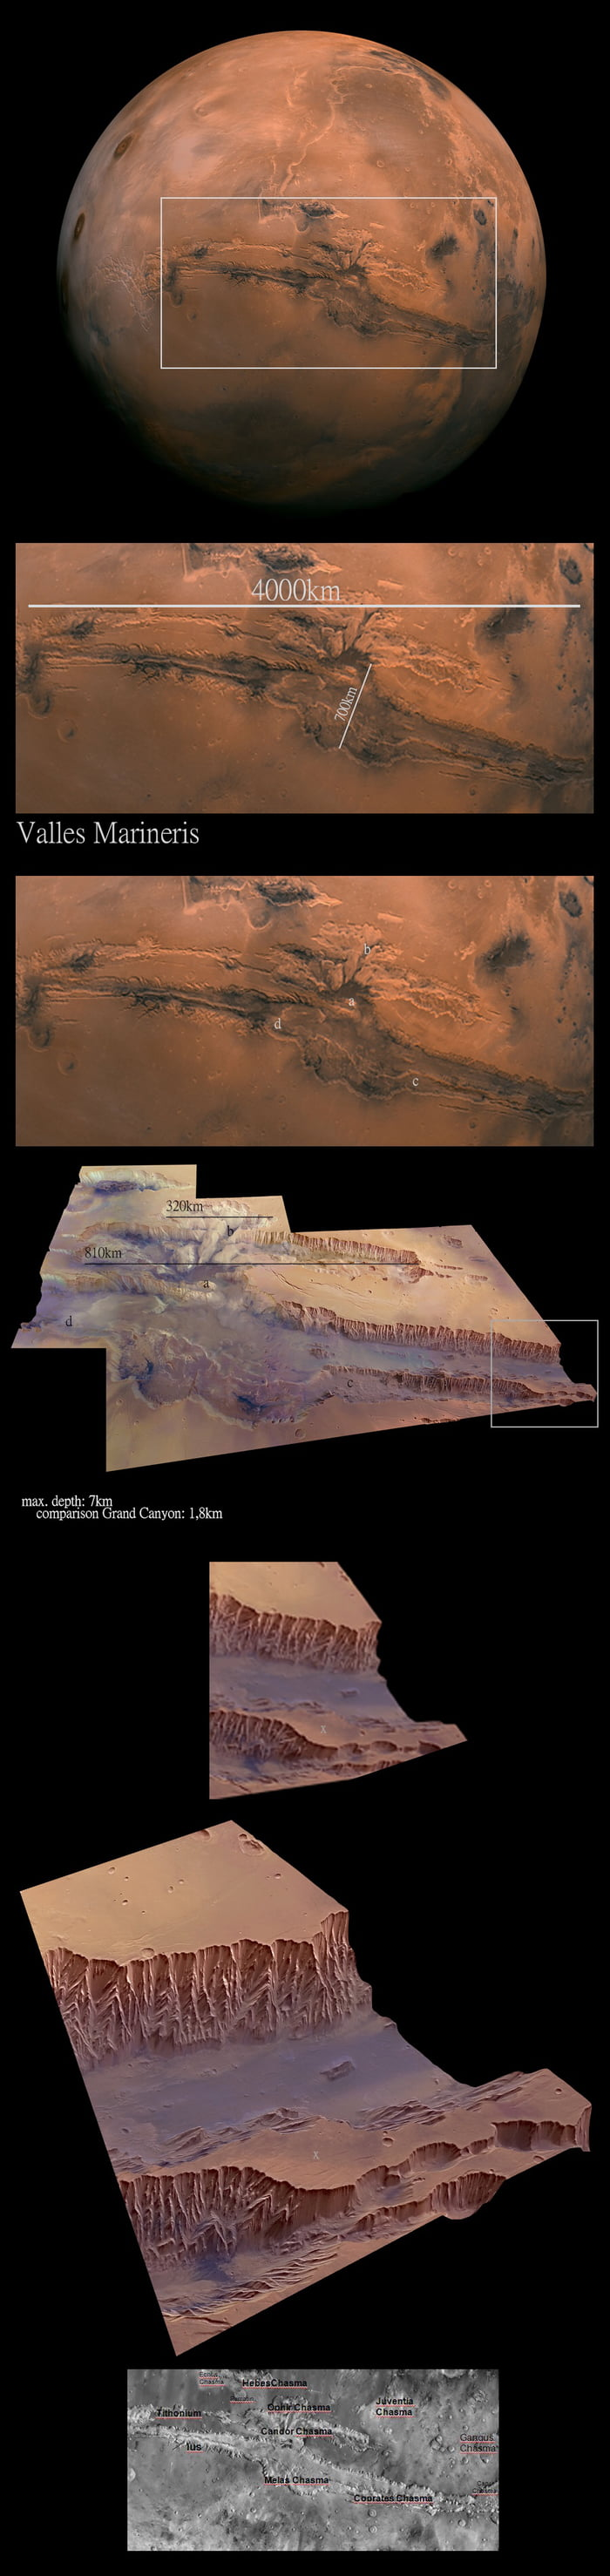 Mars fact!